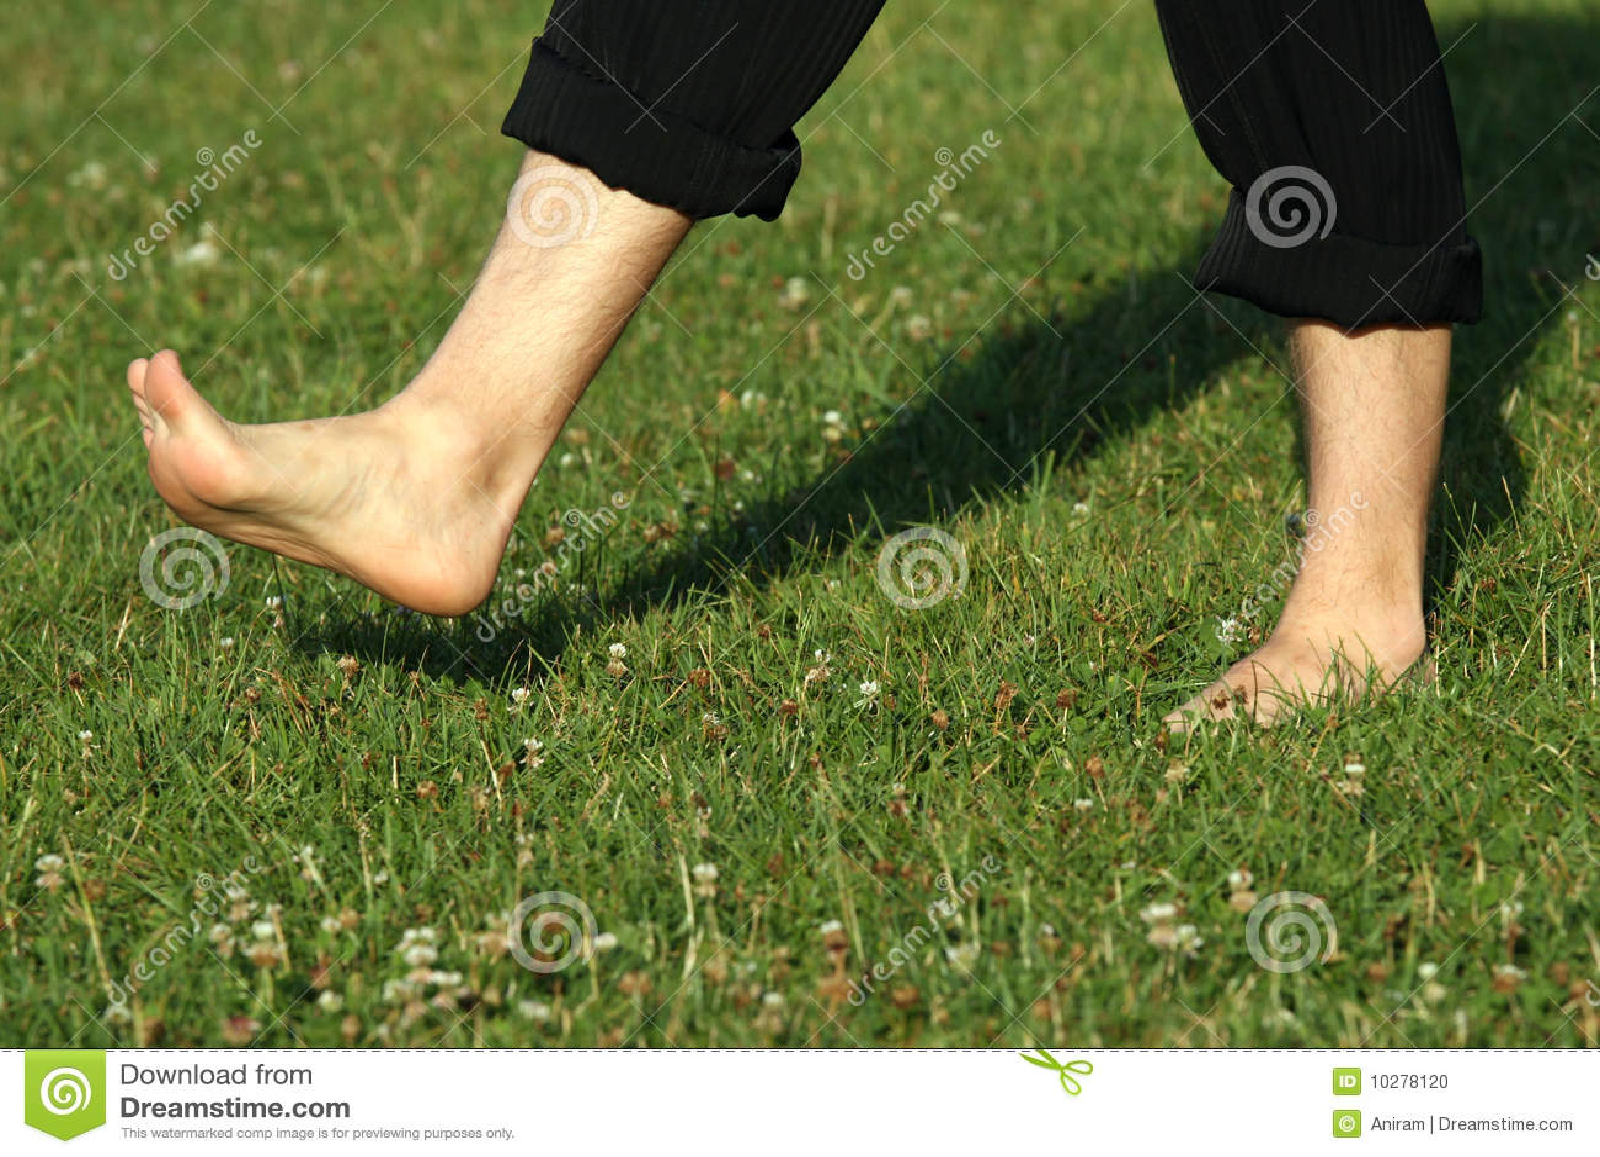 Walking Barefoot Stock Photo - Image: 10278120